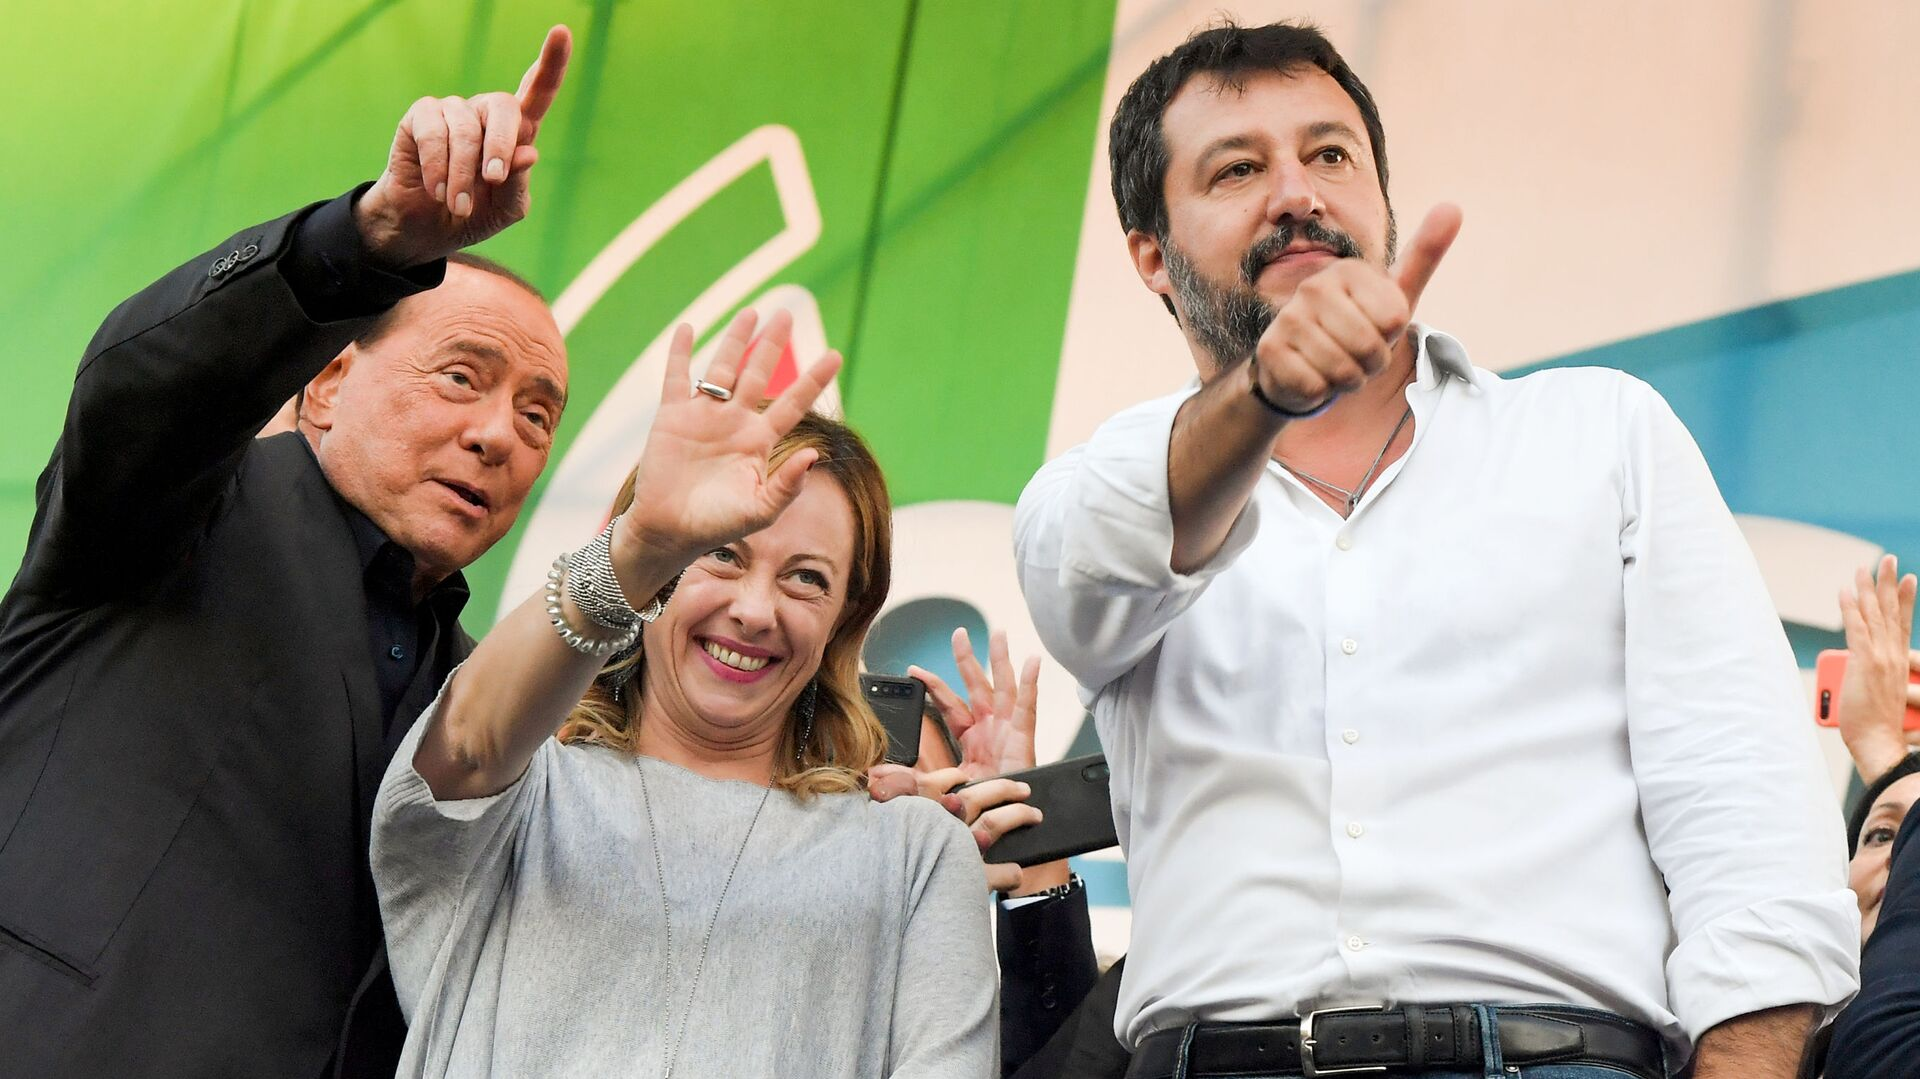 Silvio Berlusconi, Giorgia Meloni e Matteo Salvini - Sputnik Italia, 1920, 21.08.2021